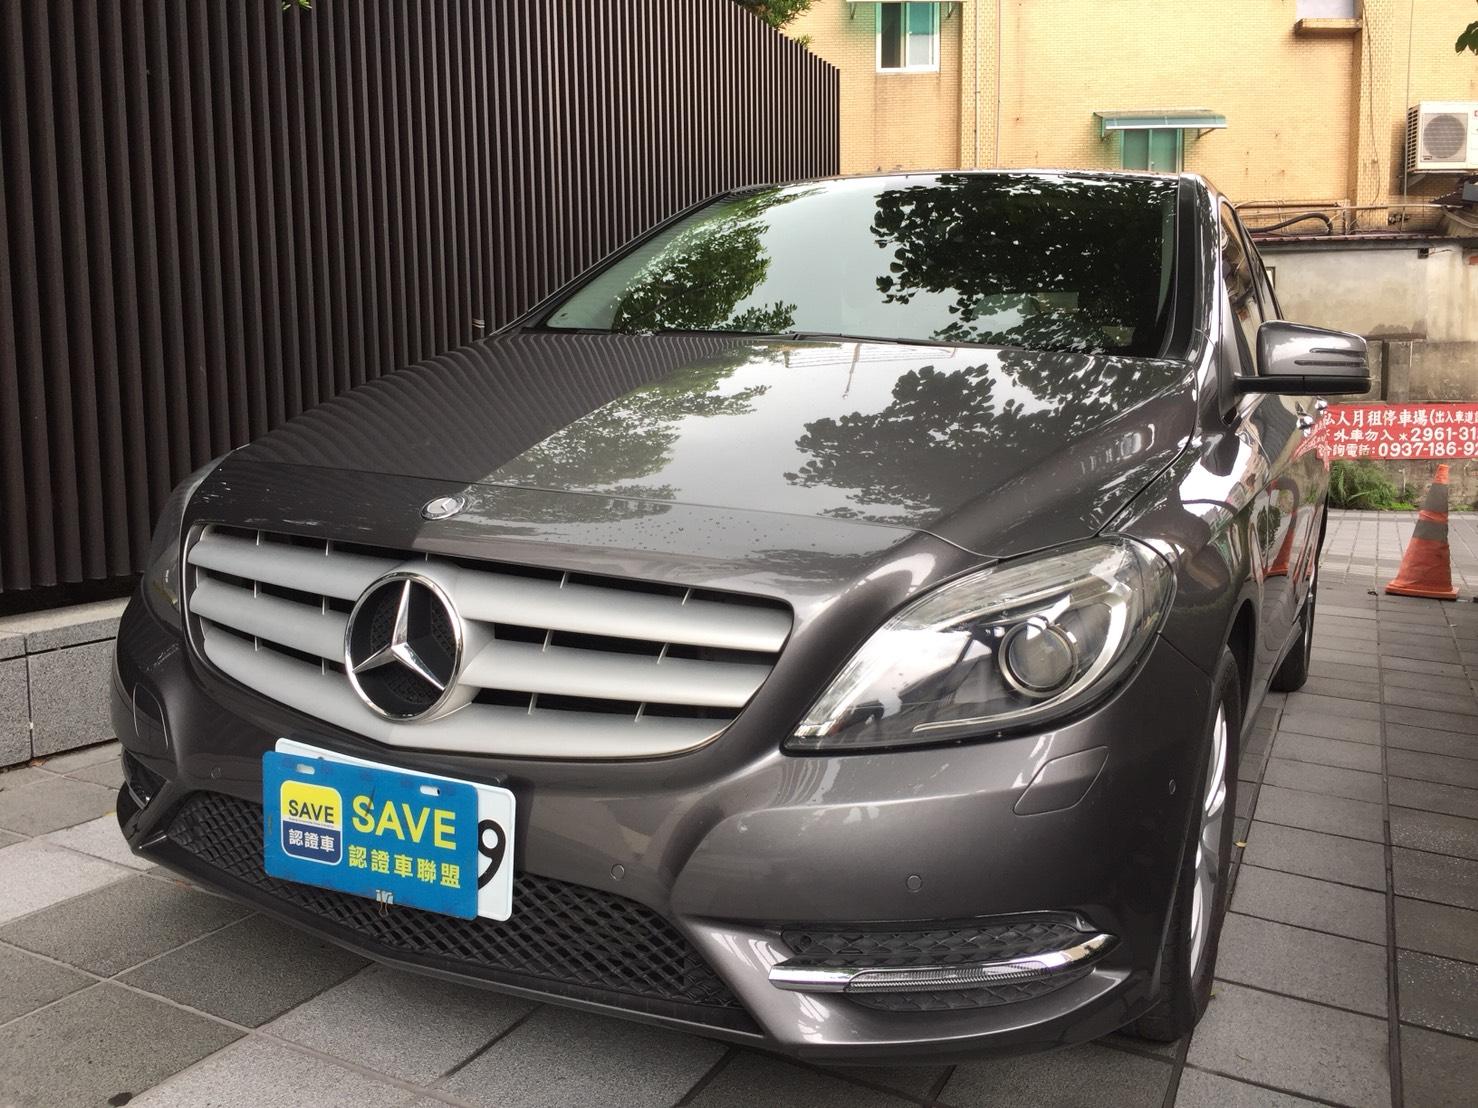 BENZ B180/1600C.C./灰色2014年/售價:79.8萬